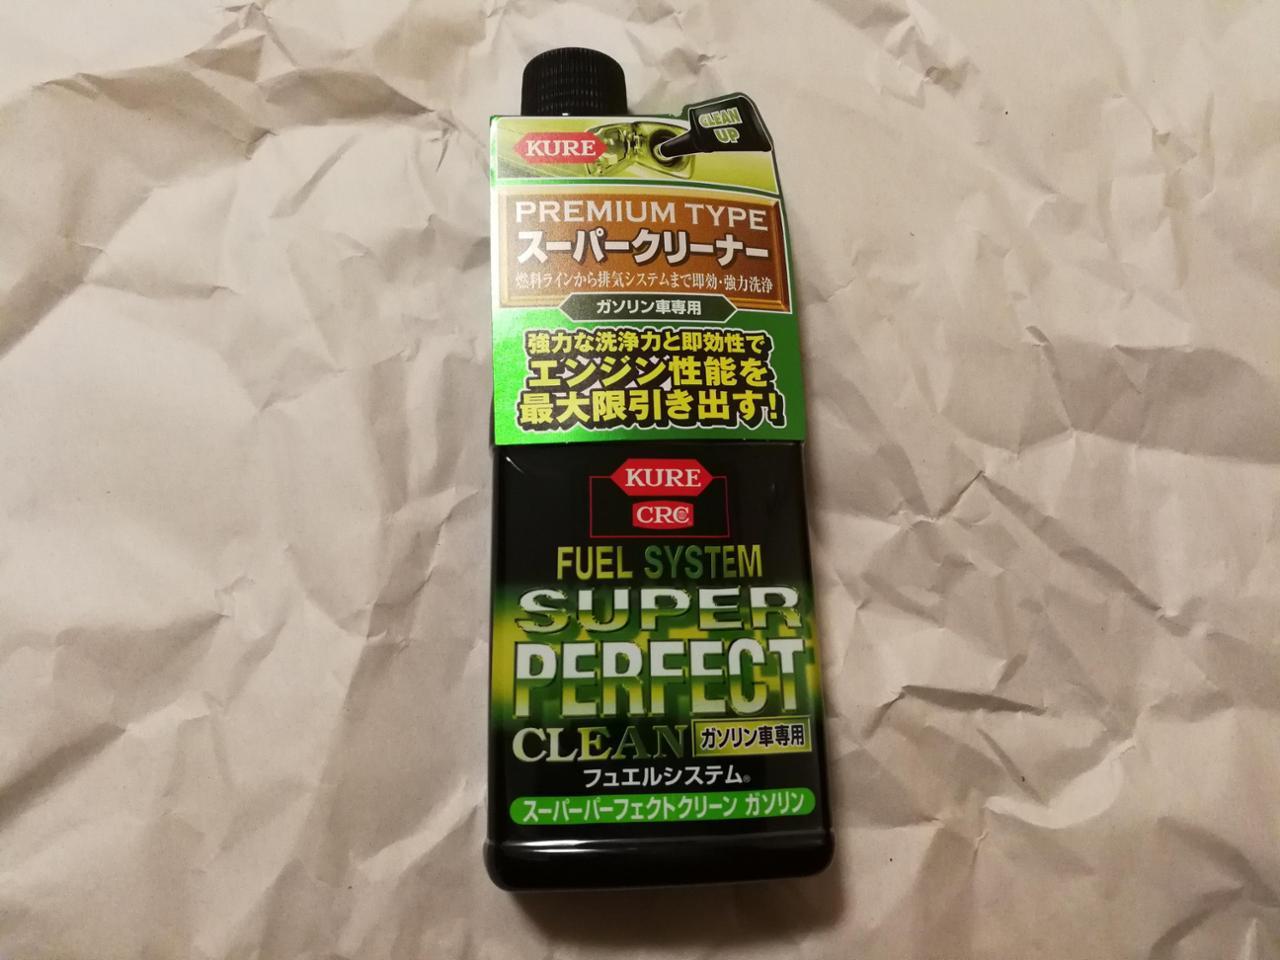 KURE / 呉工業 FUEL SYSTEM SUPER PERFECT CLEAN ガソリン車専用 / スーパーパーフェクトクリーン